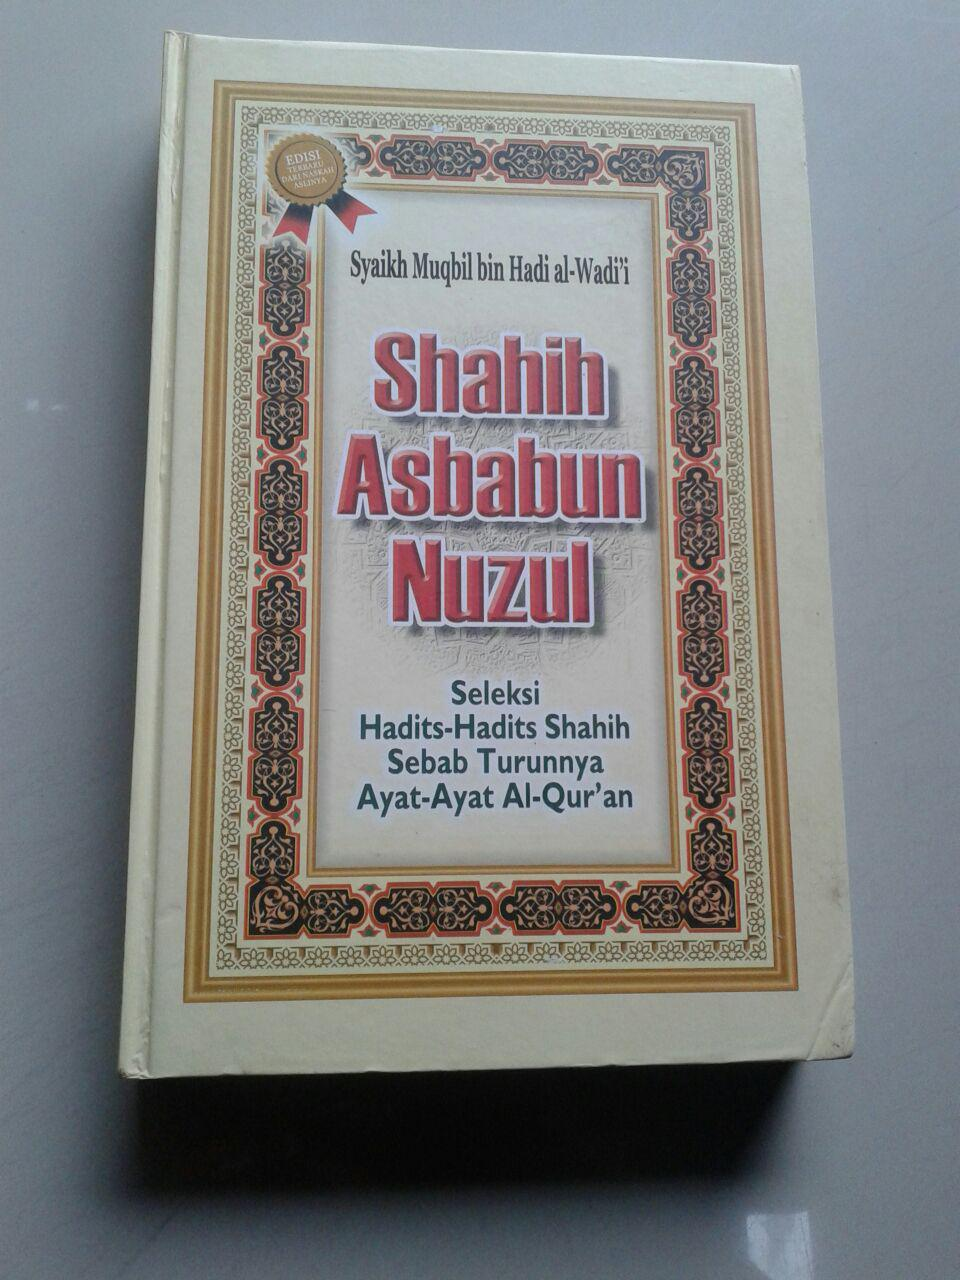 Buku Shahih Asbabun Nuzul Hadits Hadits Sebab Turunnya Ayat cover 2